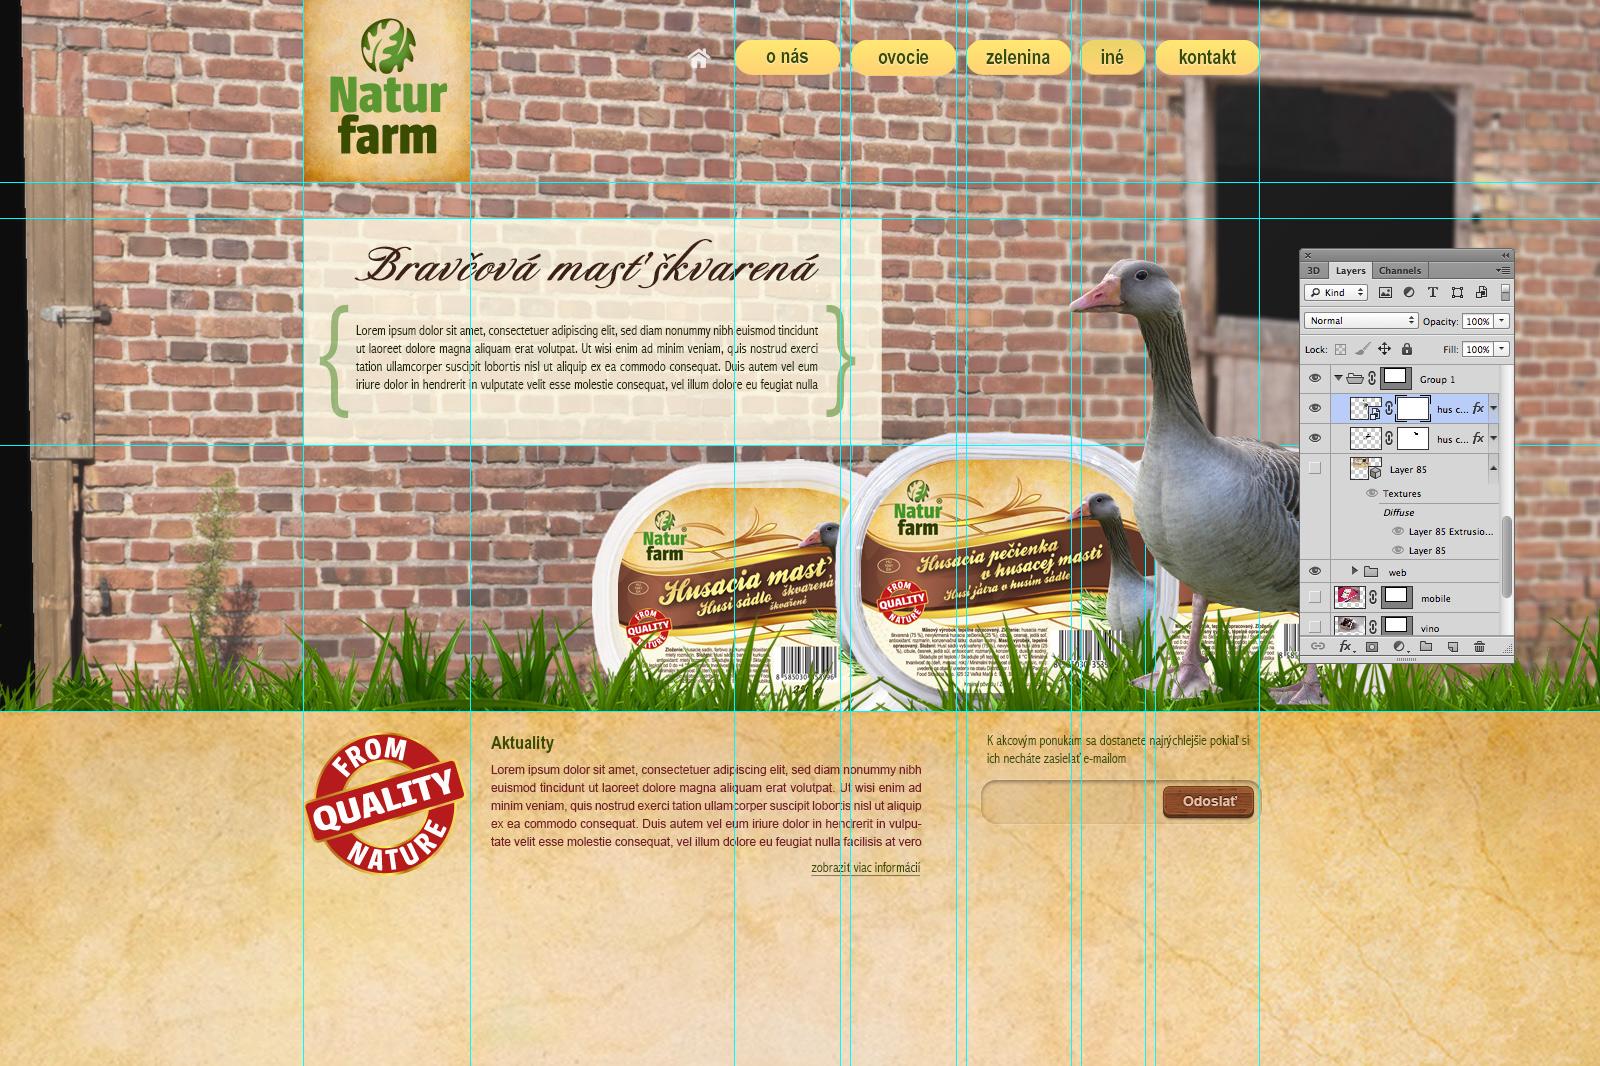 Produktové etikety Naturfarm